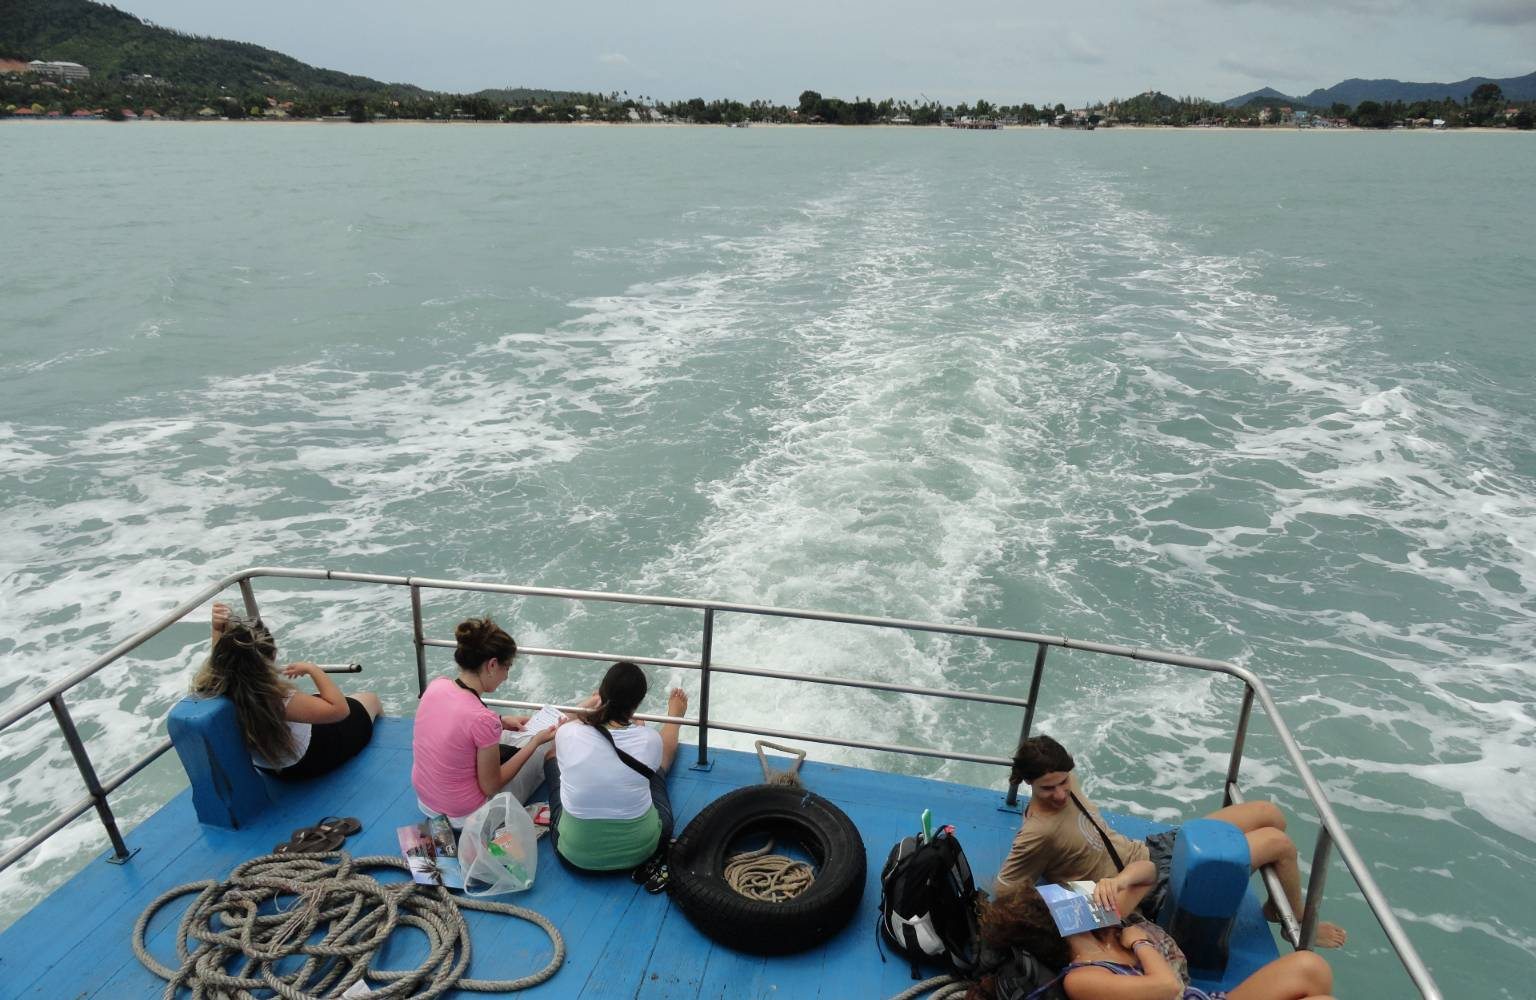 De ferry van Chumphon naar Koh Toa, Koh Phangan, Koh Samui en als eindbestemming Surat Thani